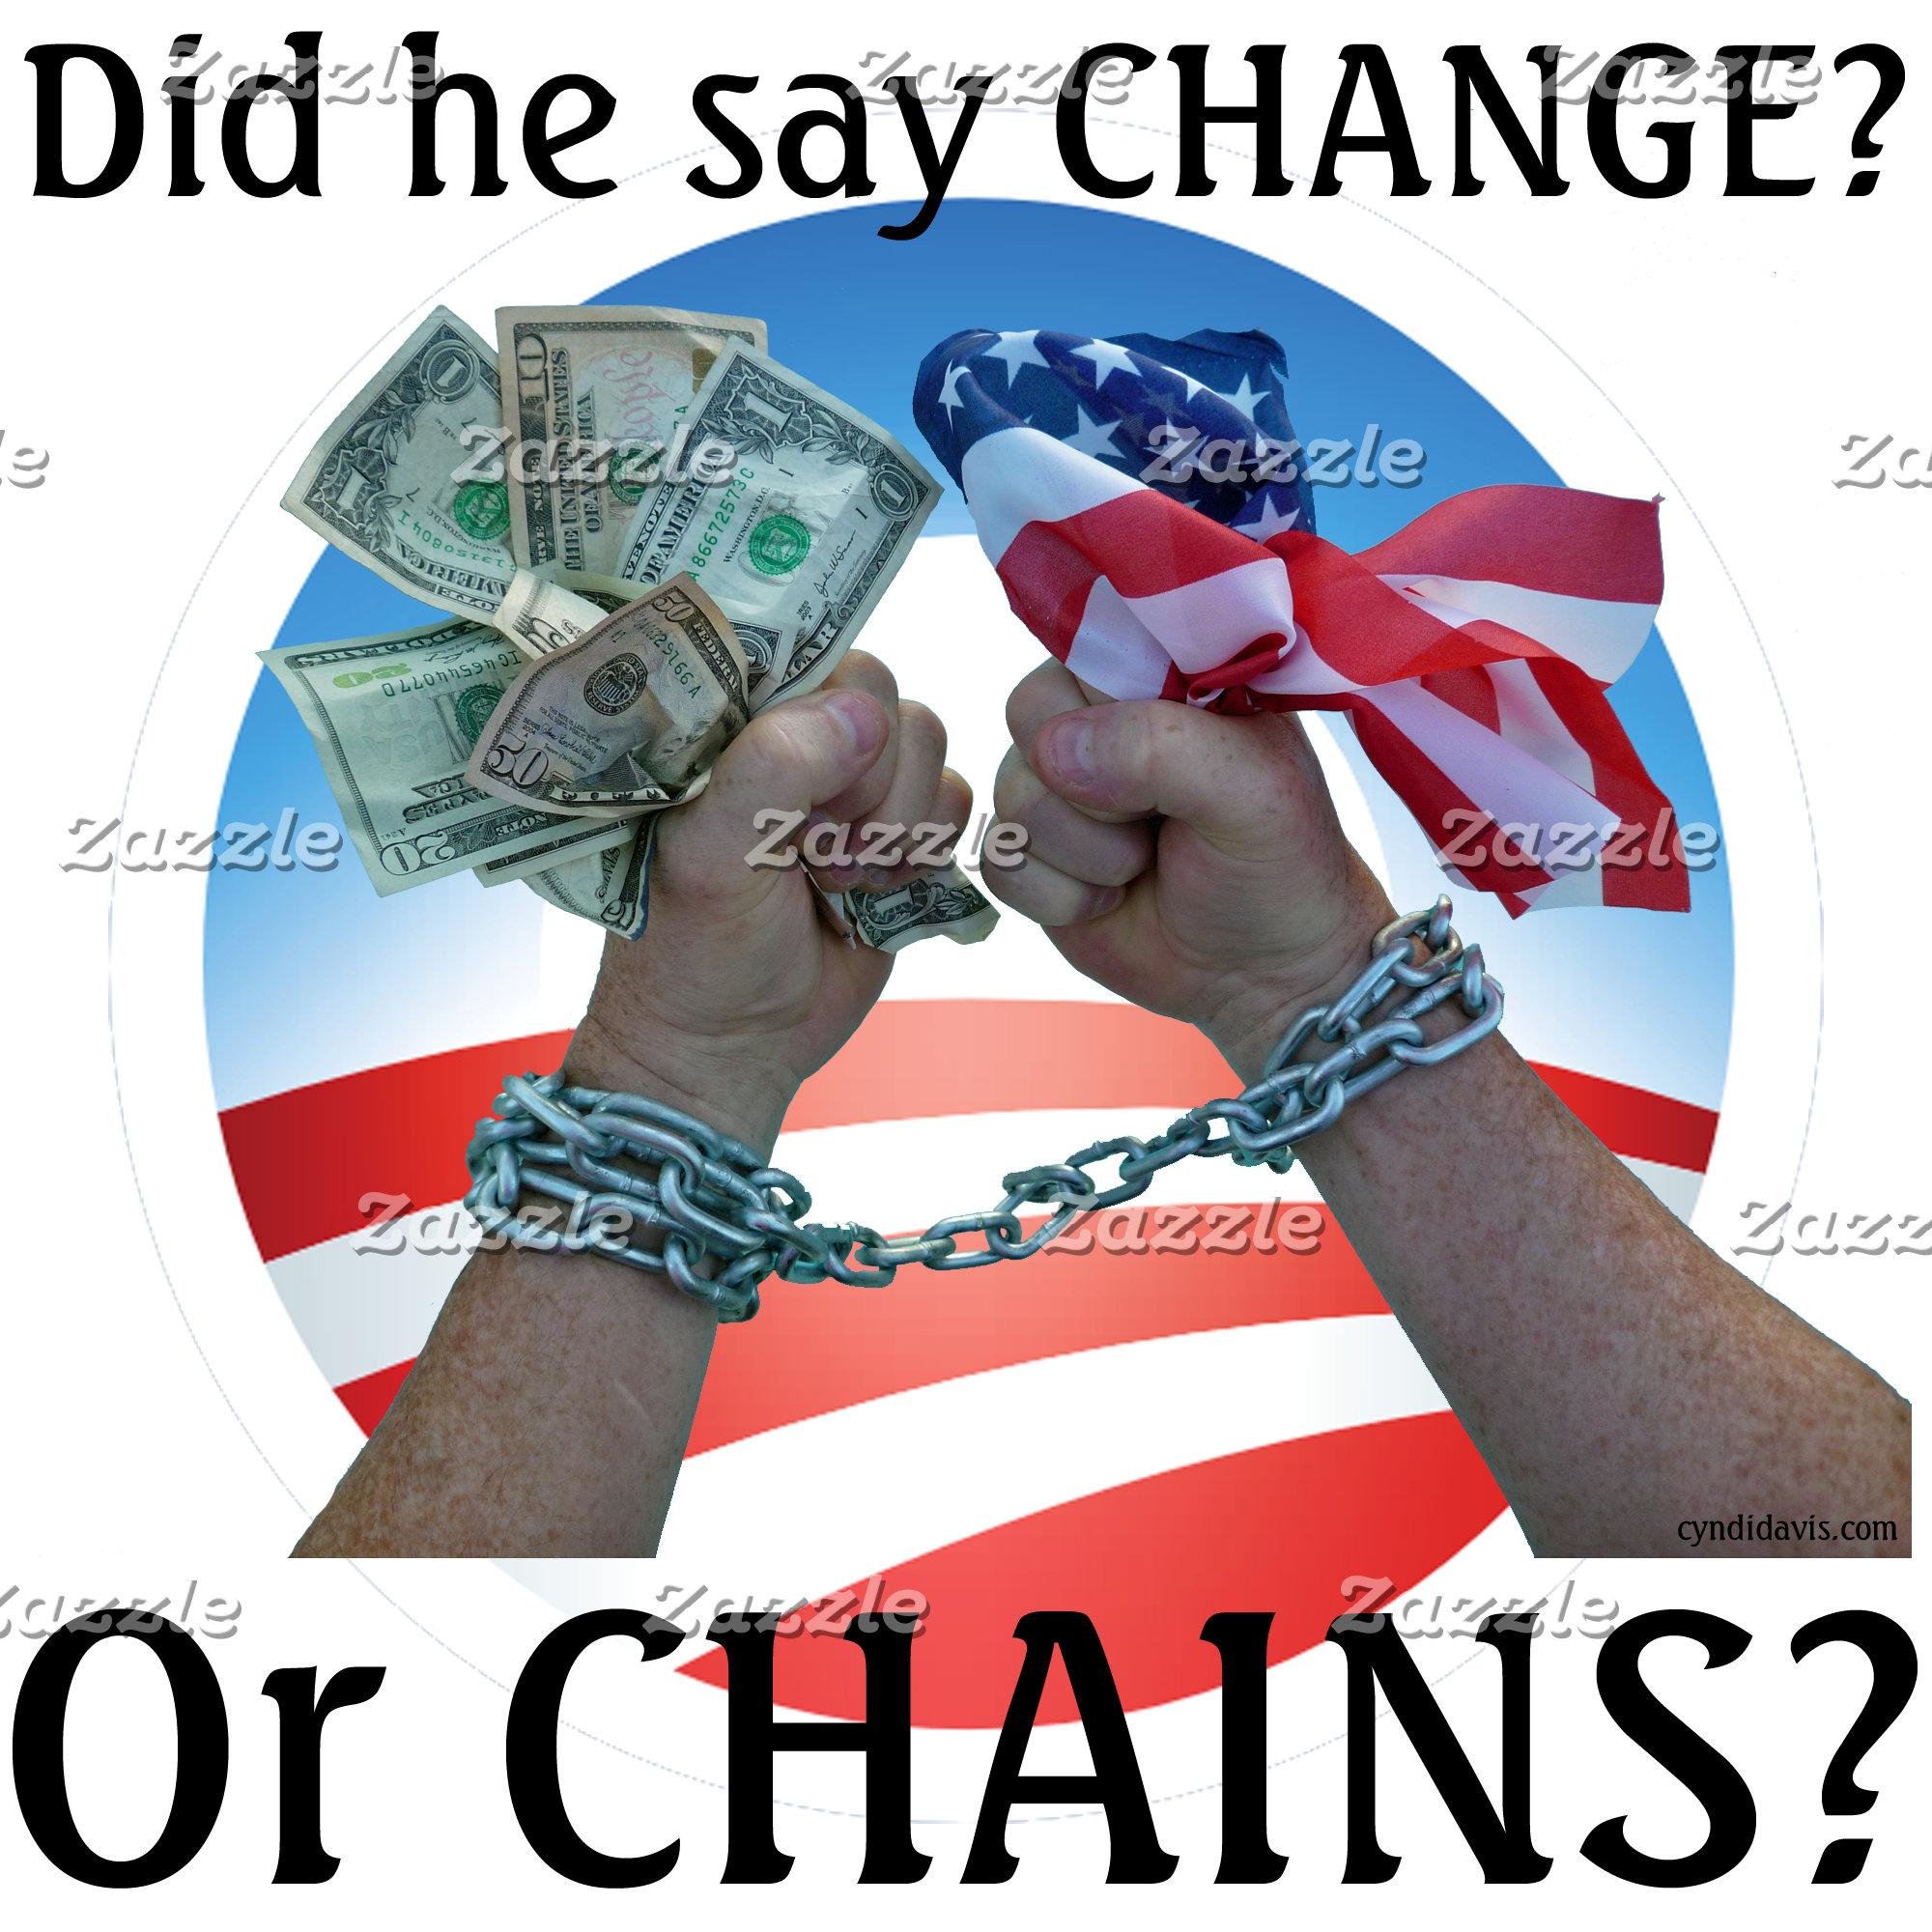 Did he say CHANGE?